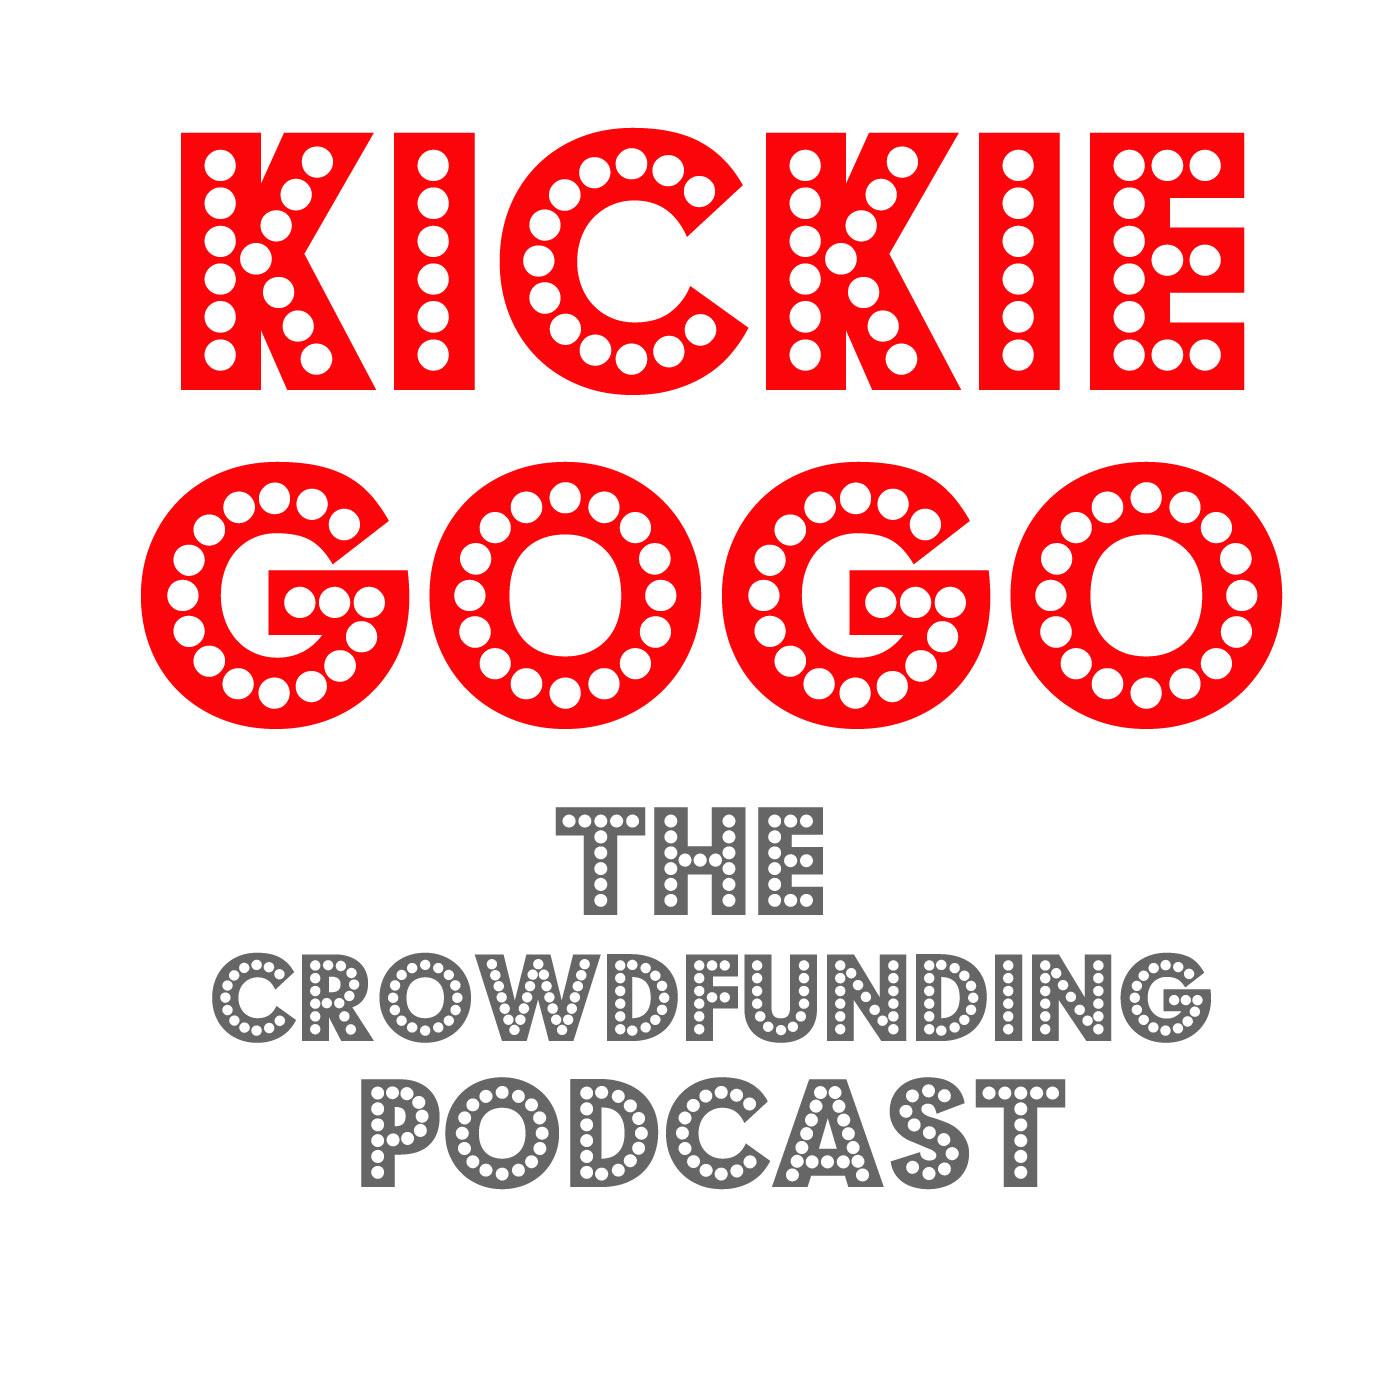 KickieGoGo - Ethan T. Berlin